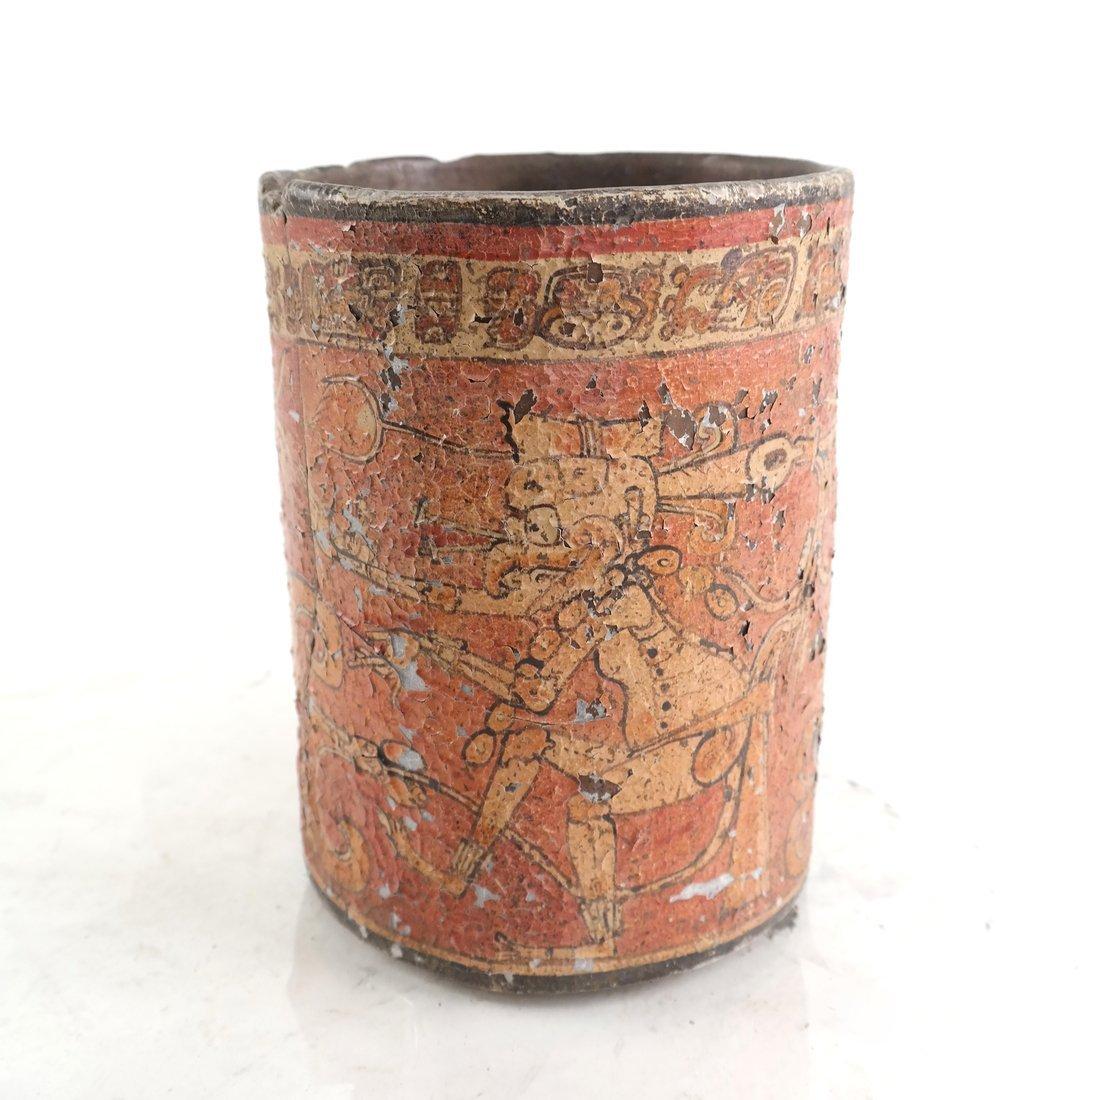 Pre-Columbian Vessel